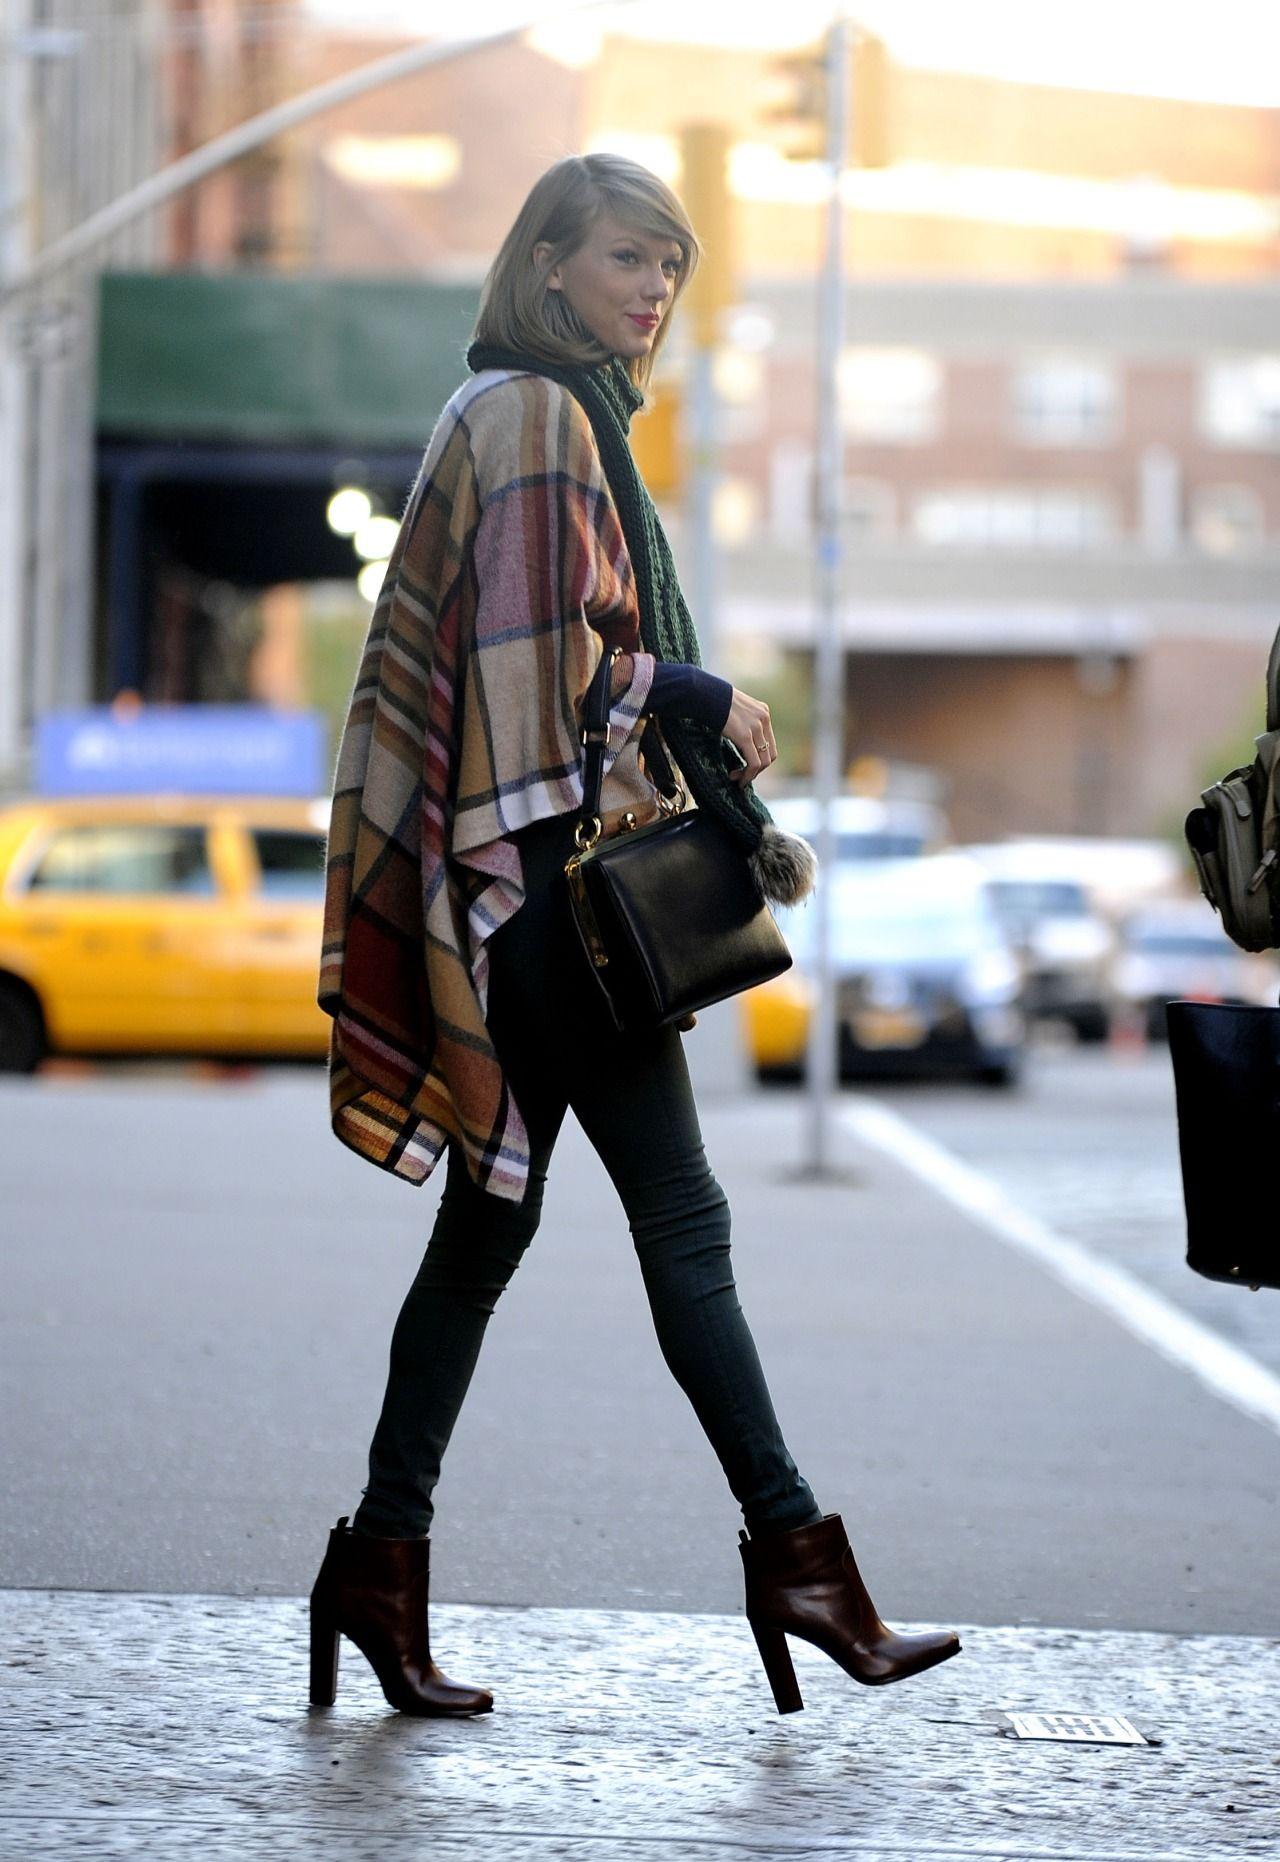 taylor-swift-block-heels